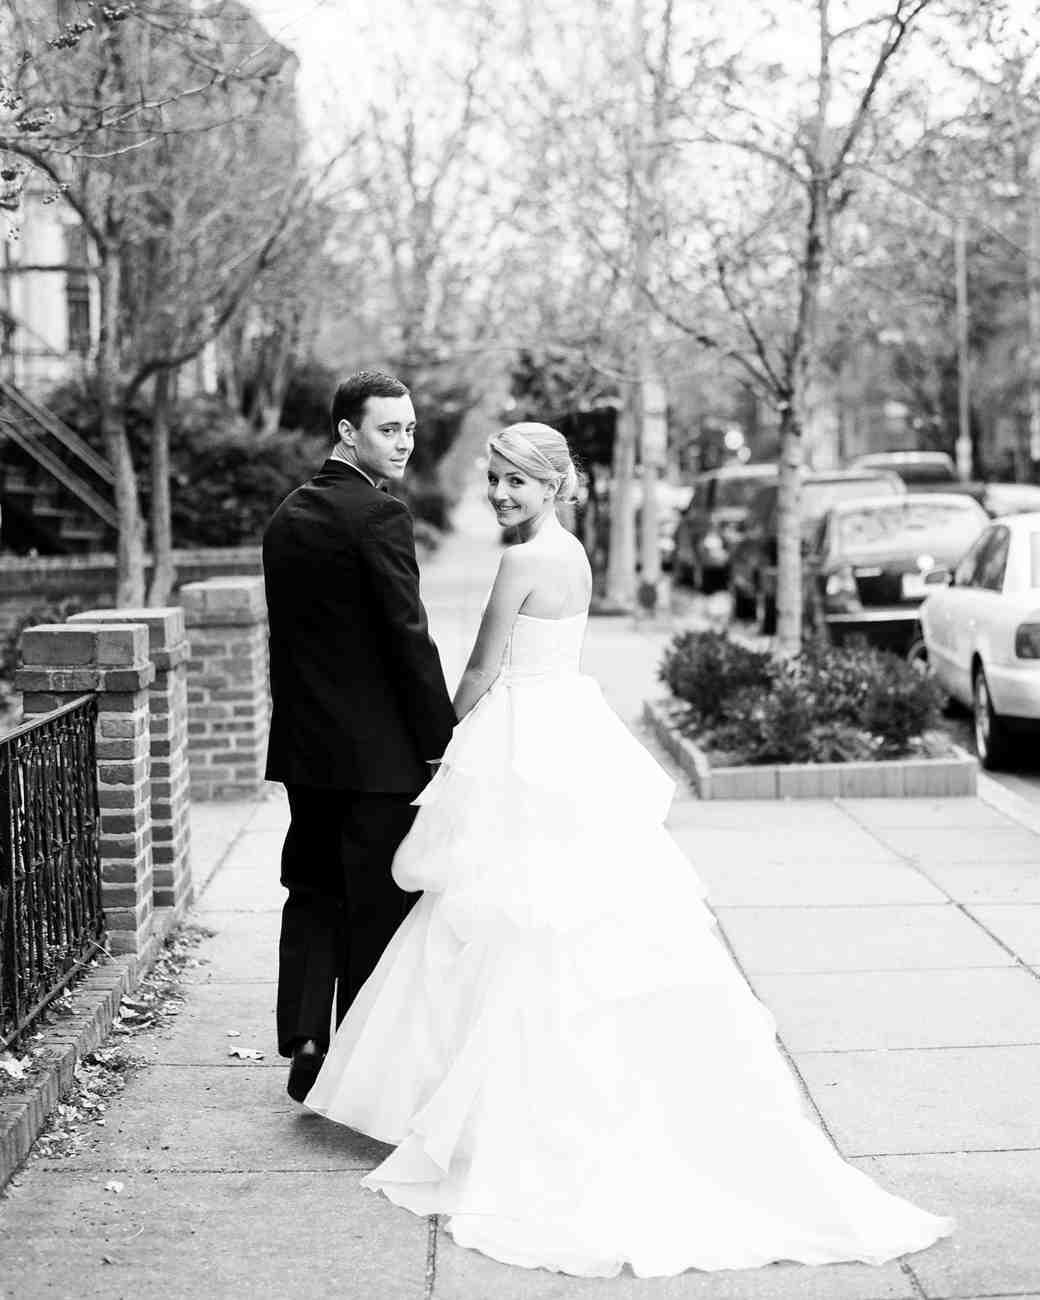 real-weddings-jess-greg-0811-452.jpg